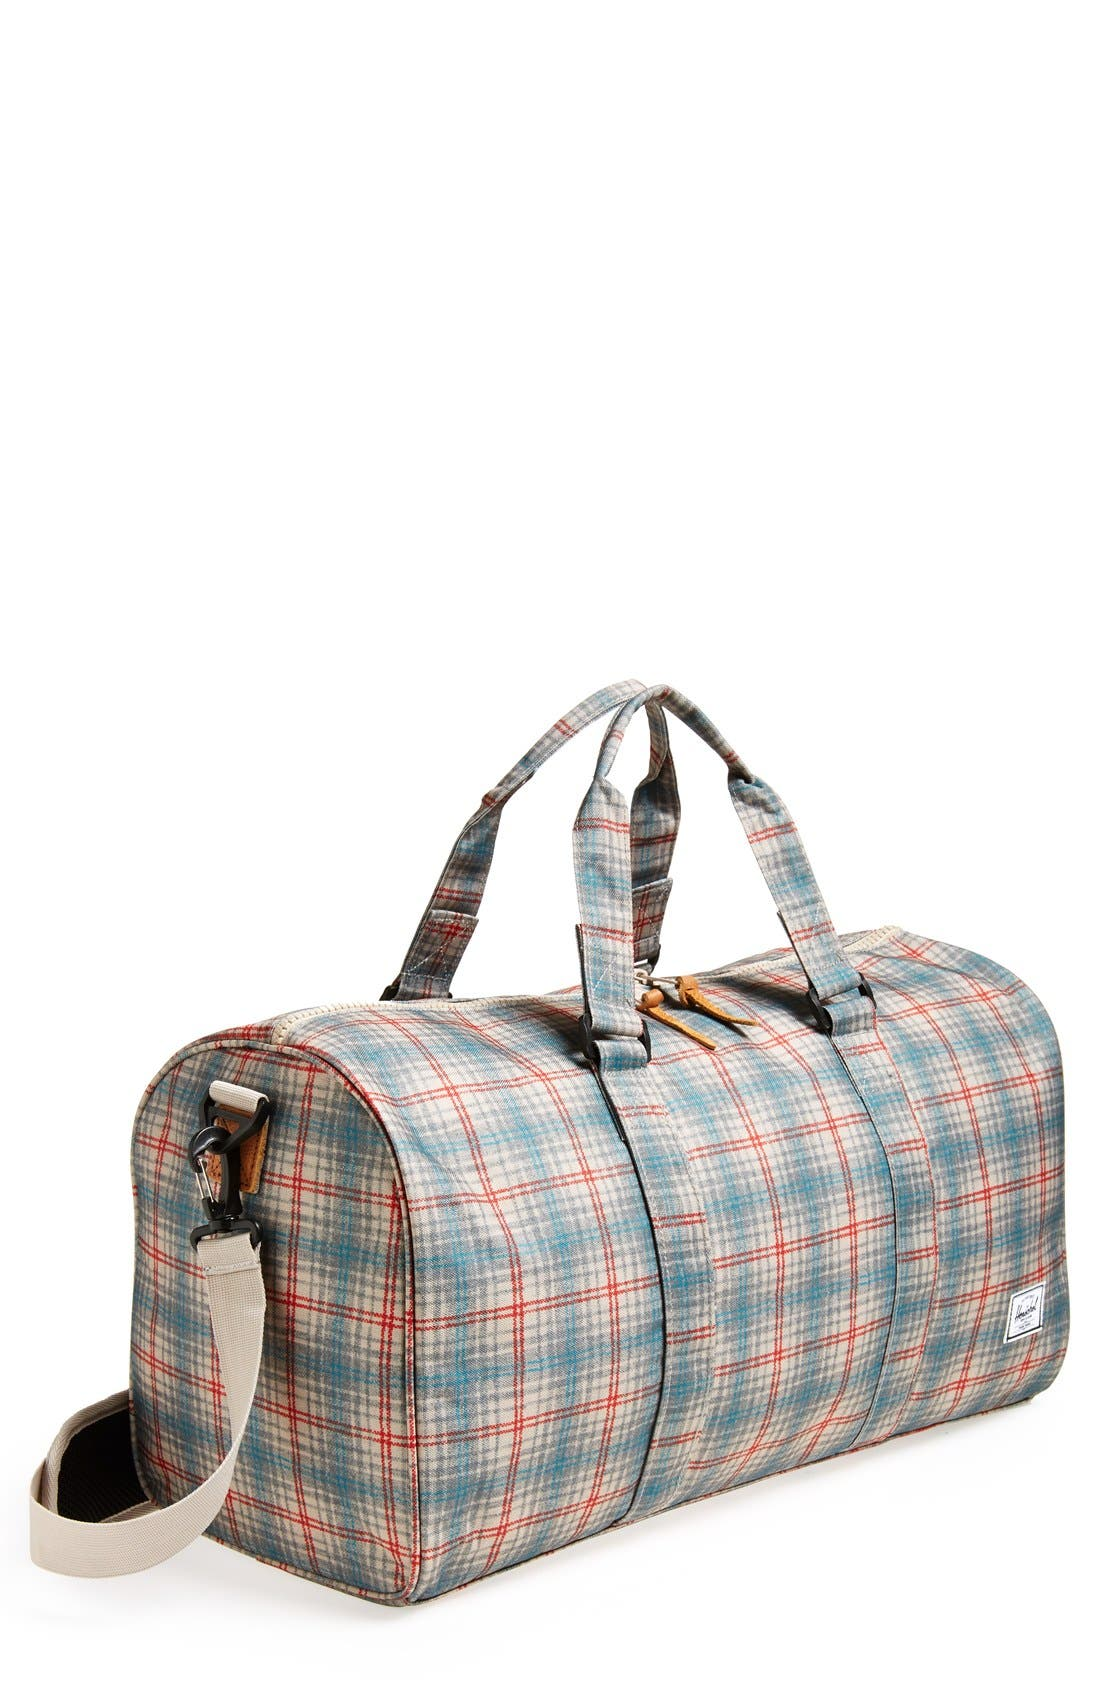 HERSCHEL SUPPLY CO. 'Ravine' Duffel Bag, Main, color, 020